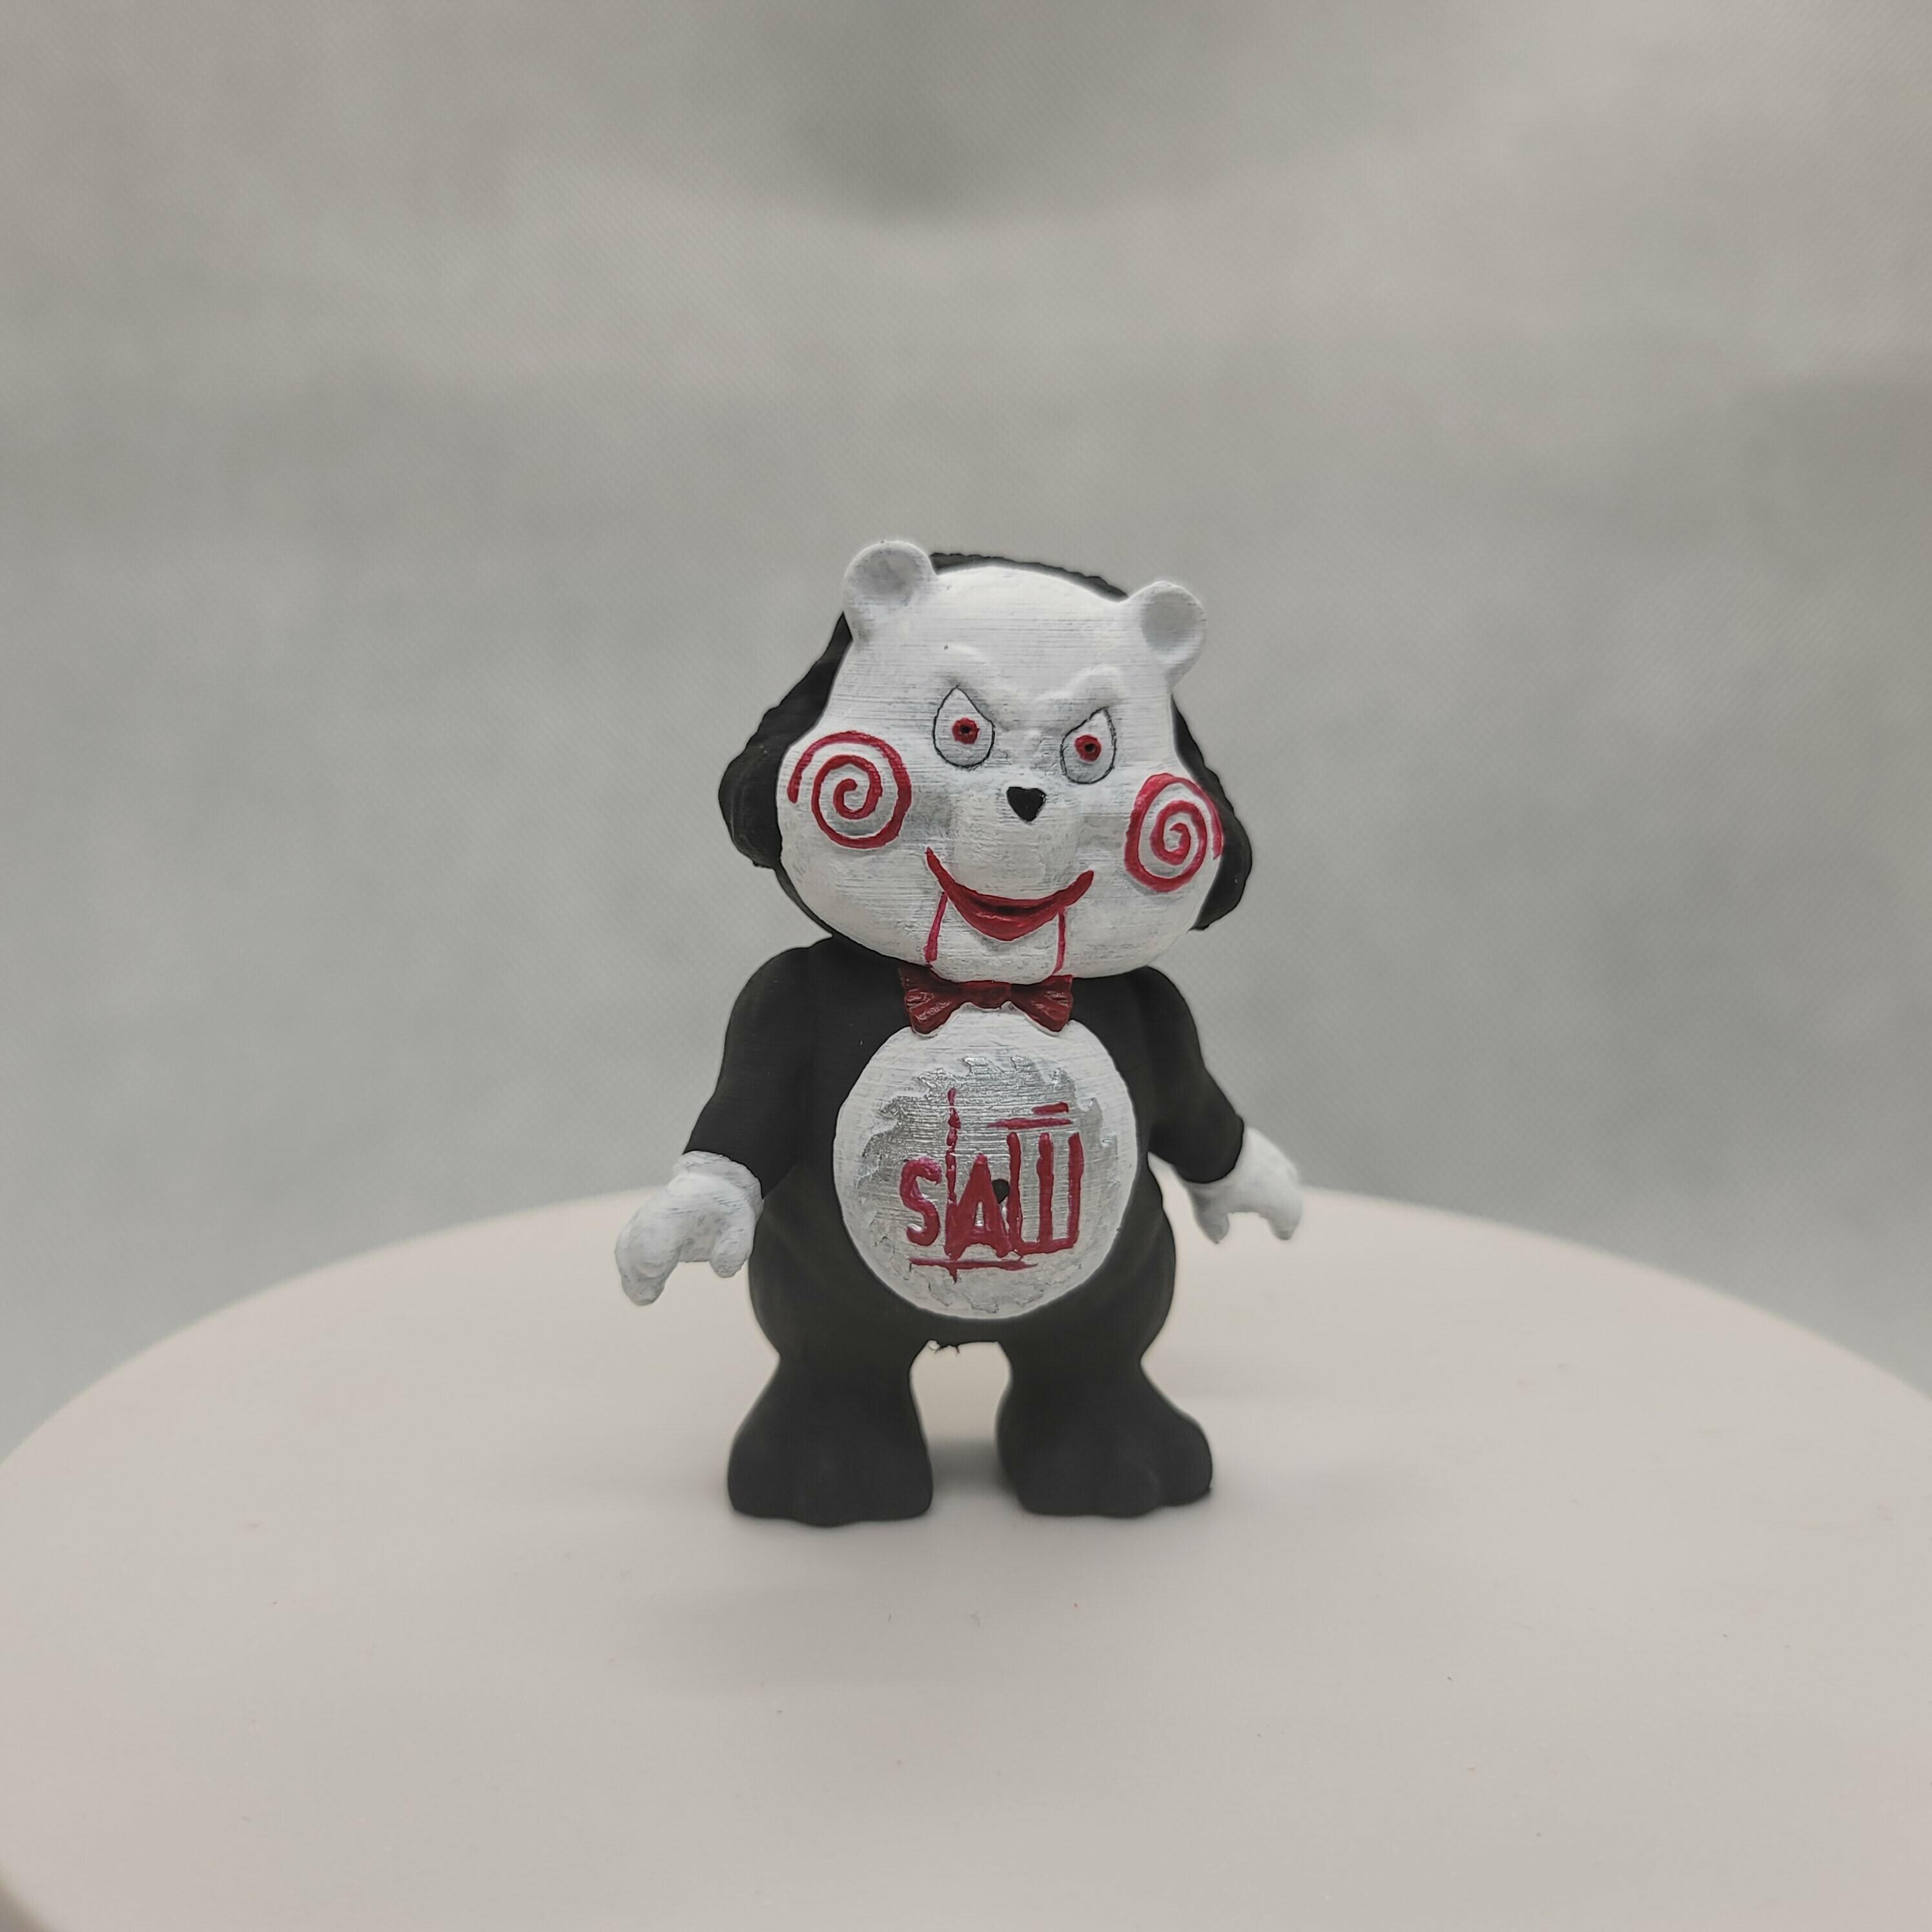 20201231_203353.jpg Download STL file No Care Bear Collection #3 • 3D printer object, LittleTup